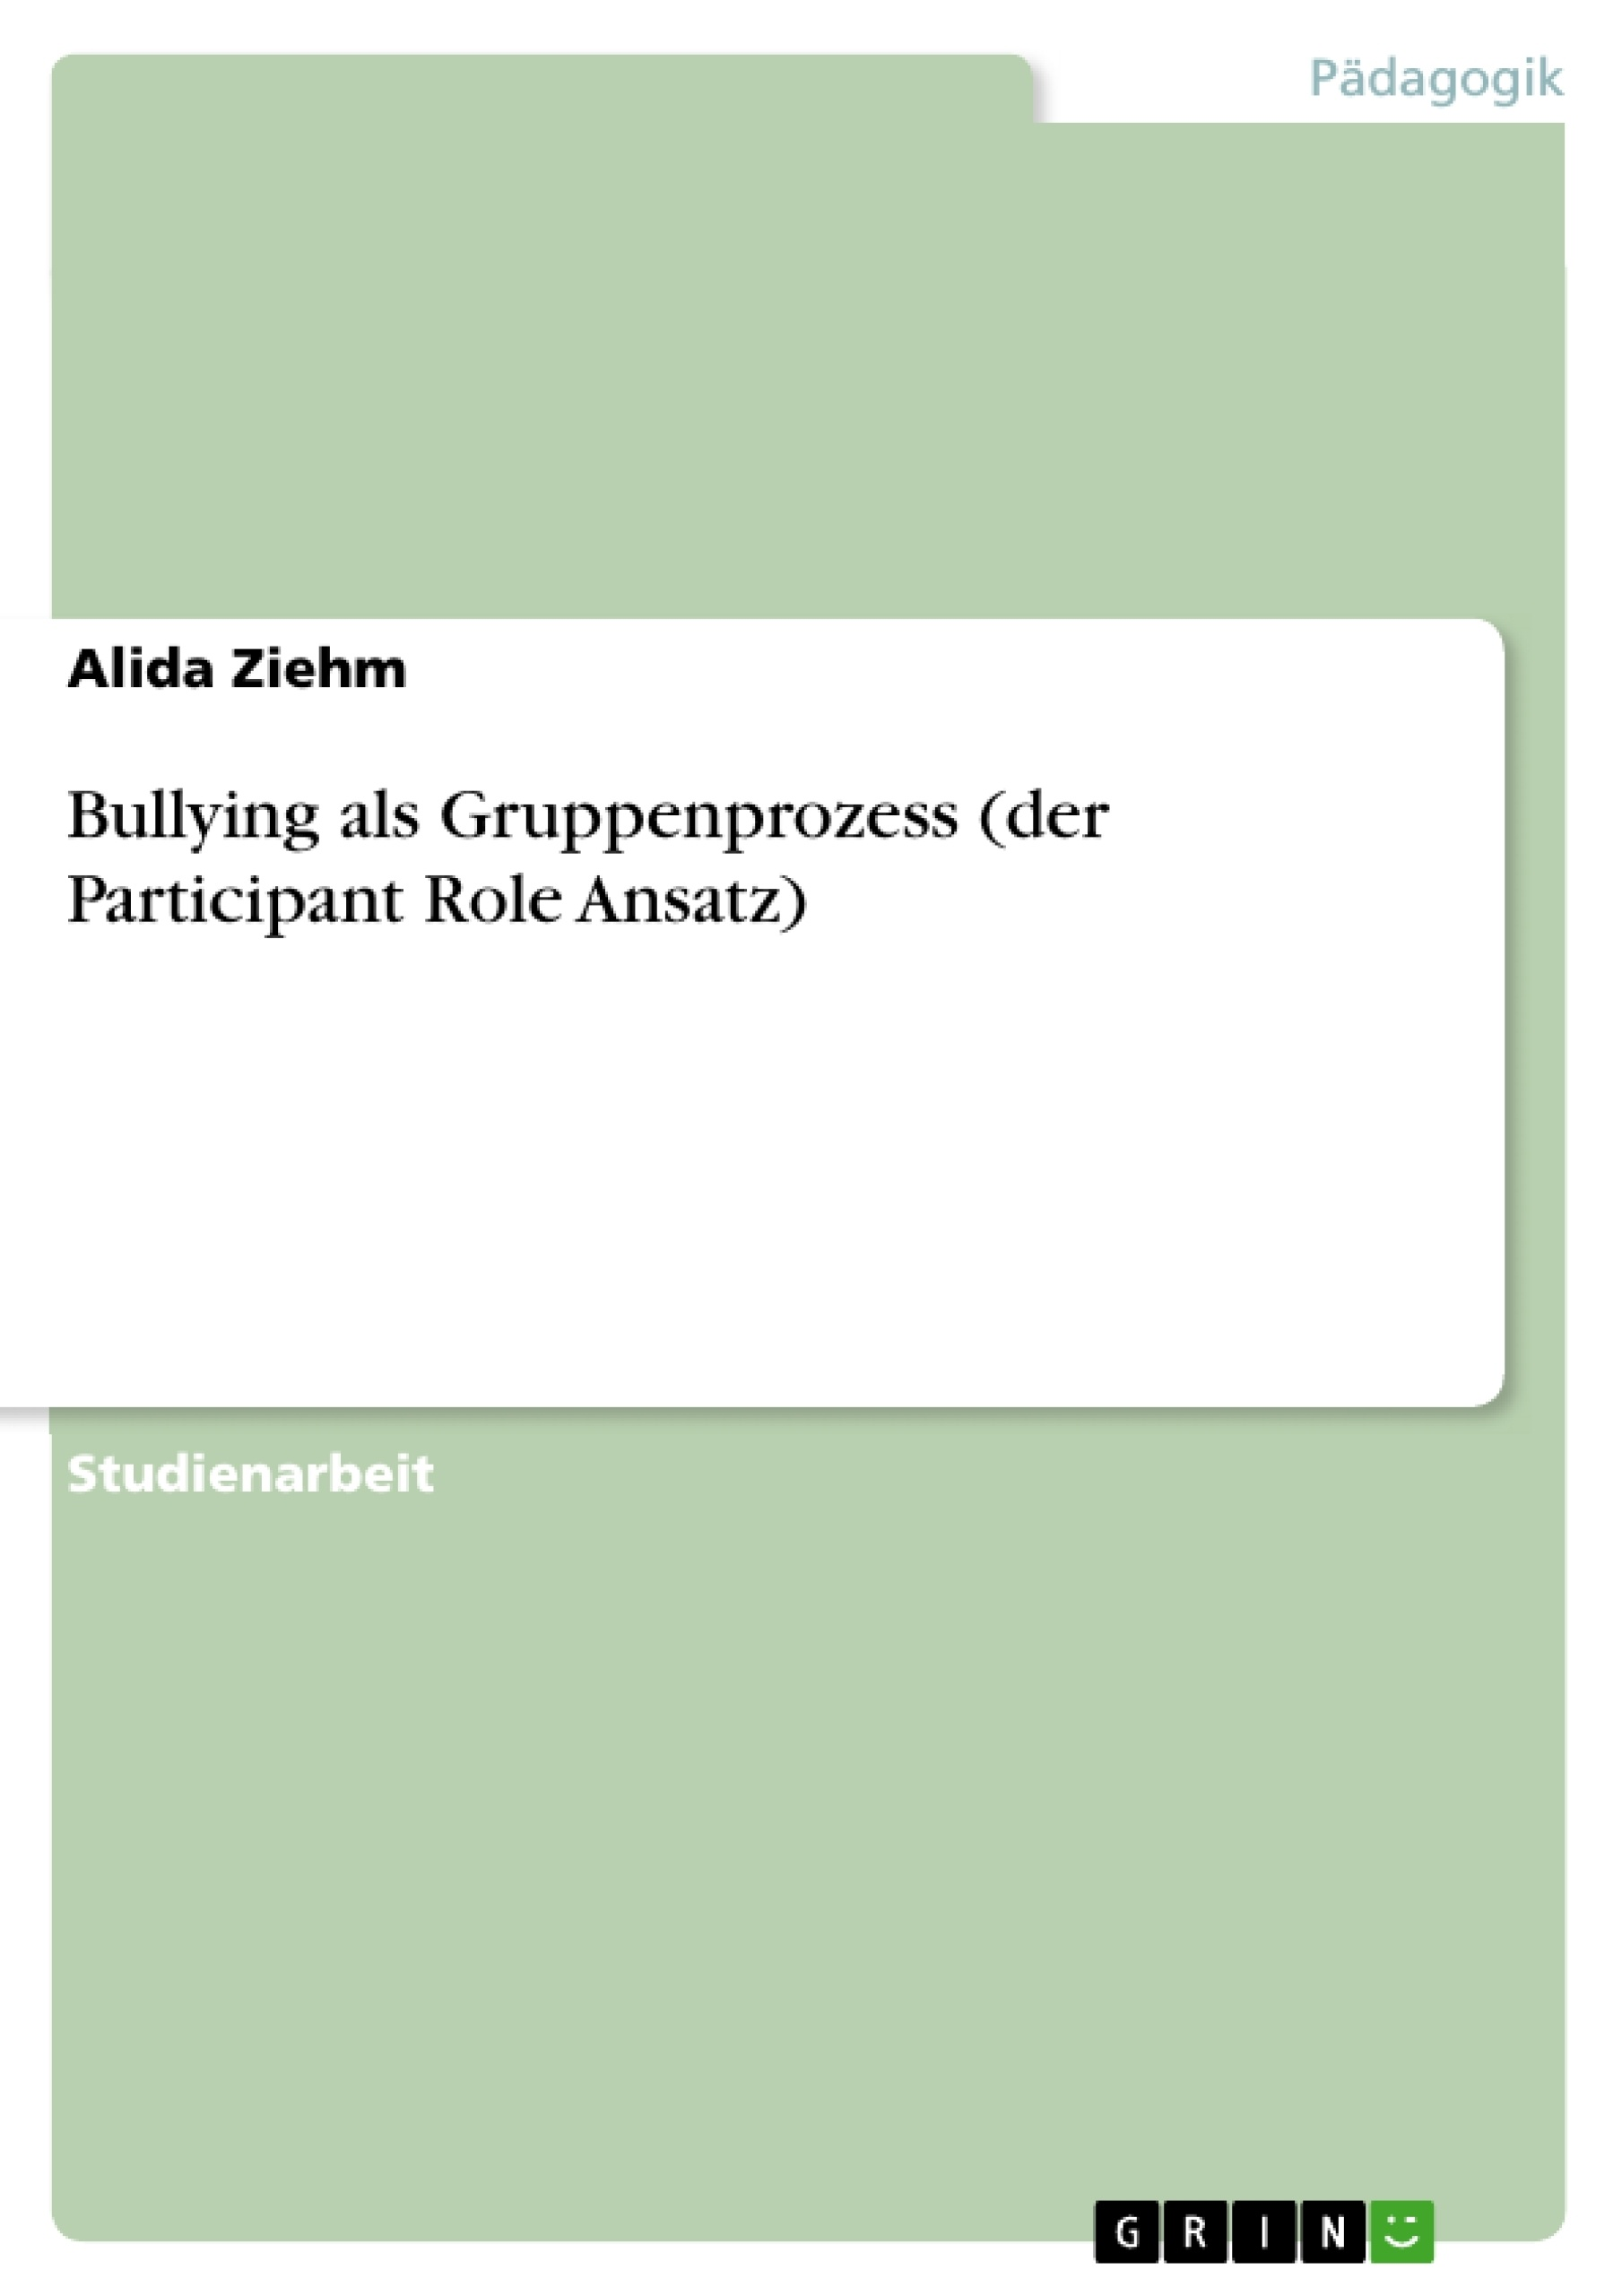 Titel: Bullying als Gruppenprozess (der Participant Role Ansatz)